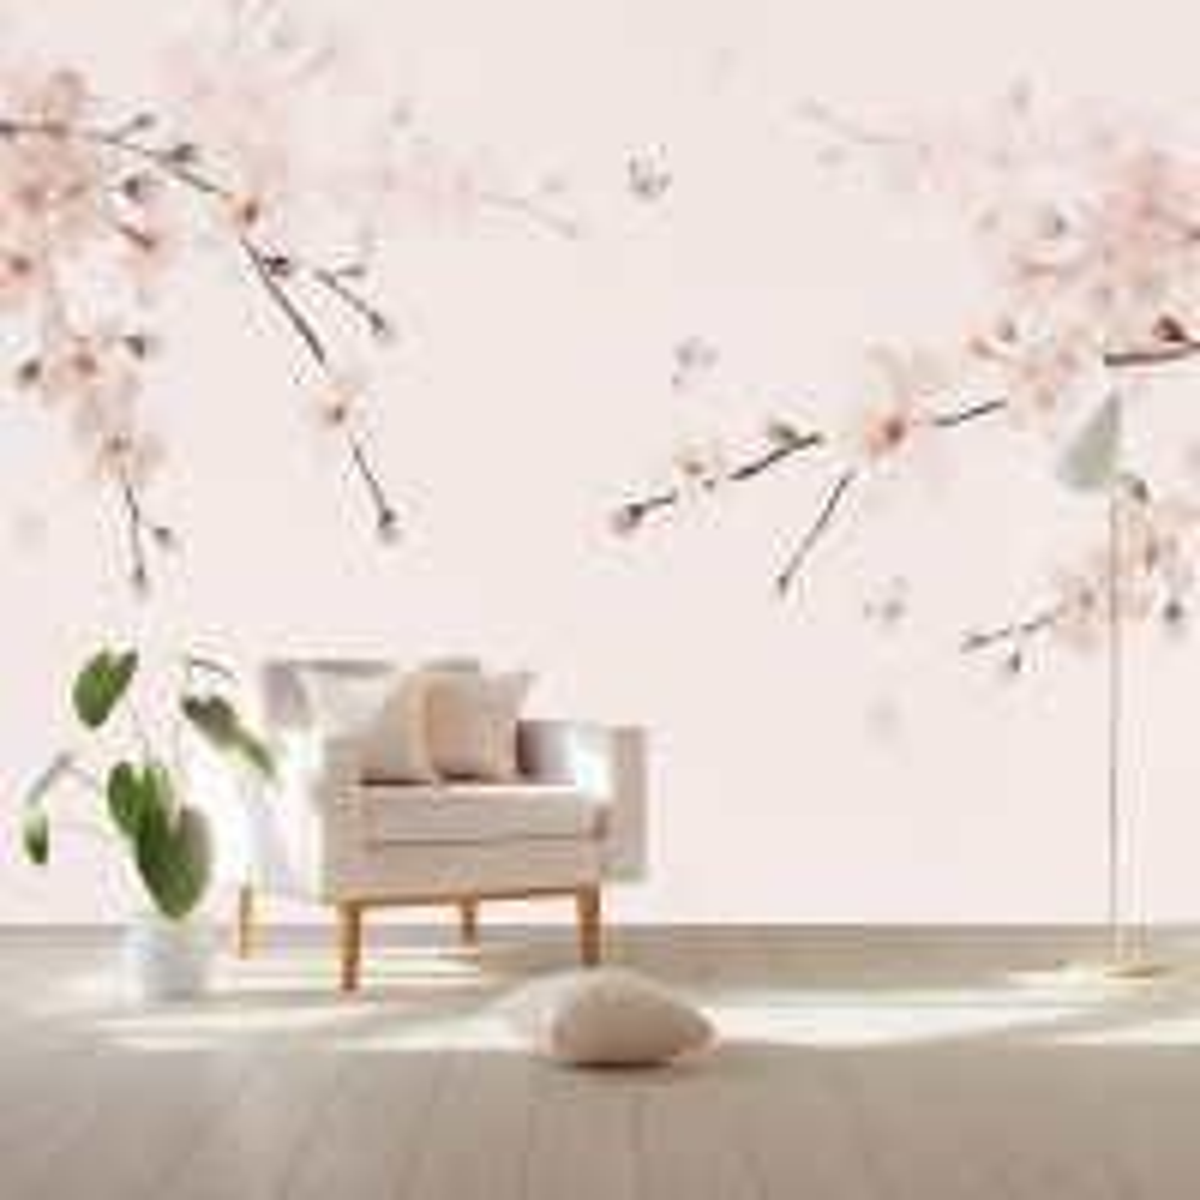 Plum Floral Art Wallpaper Mural